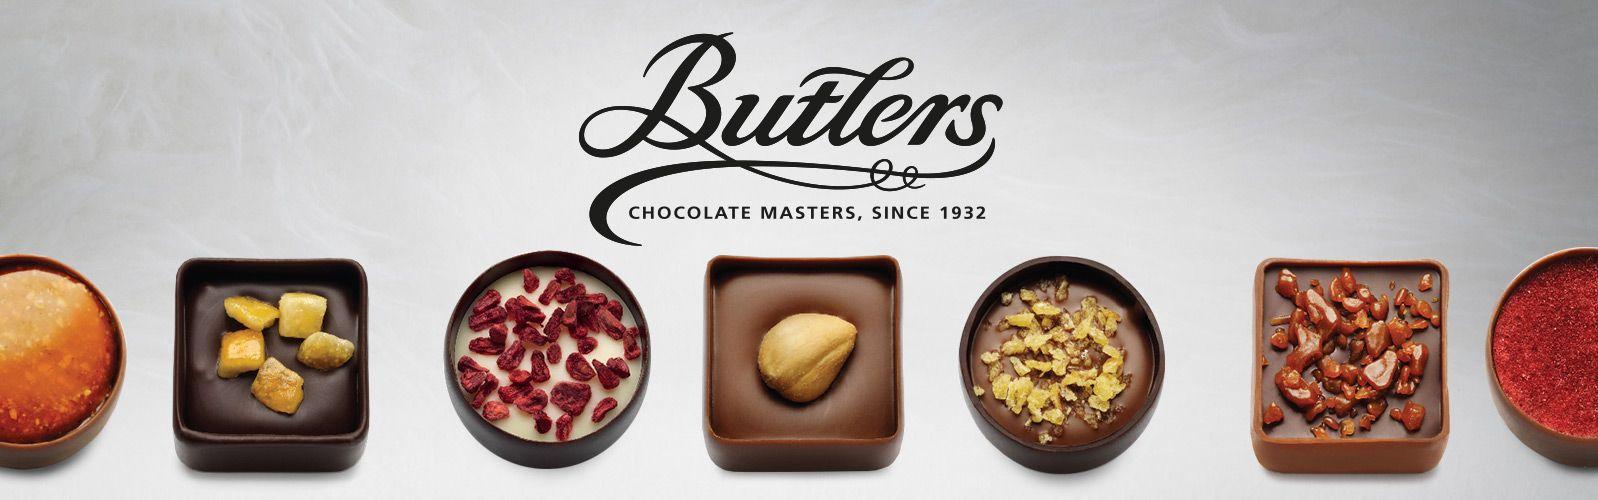 BUTLERS Premium-Schokolade